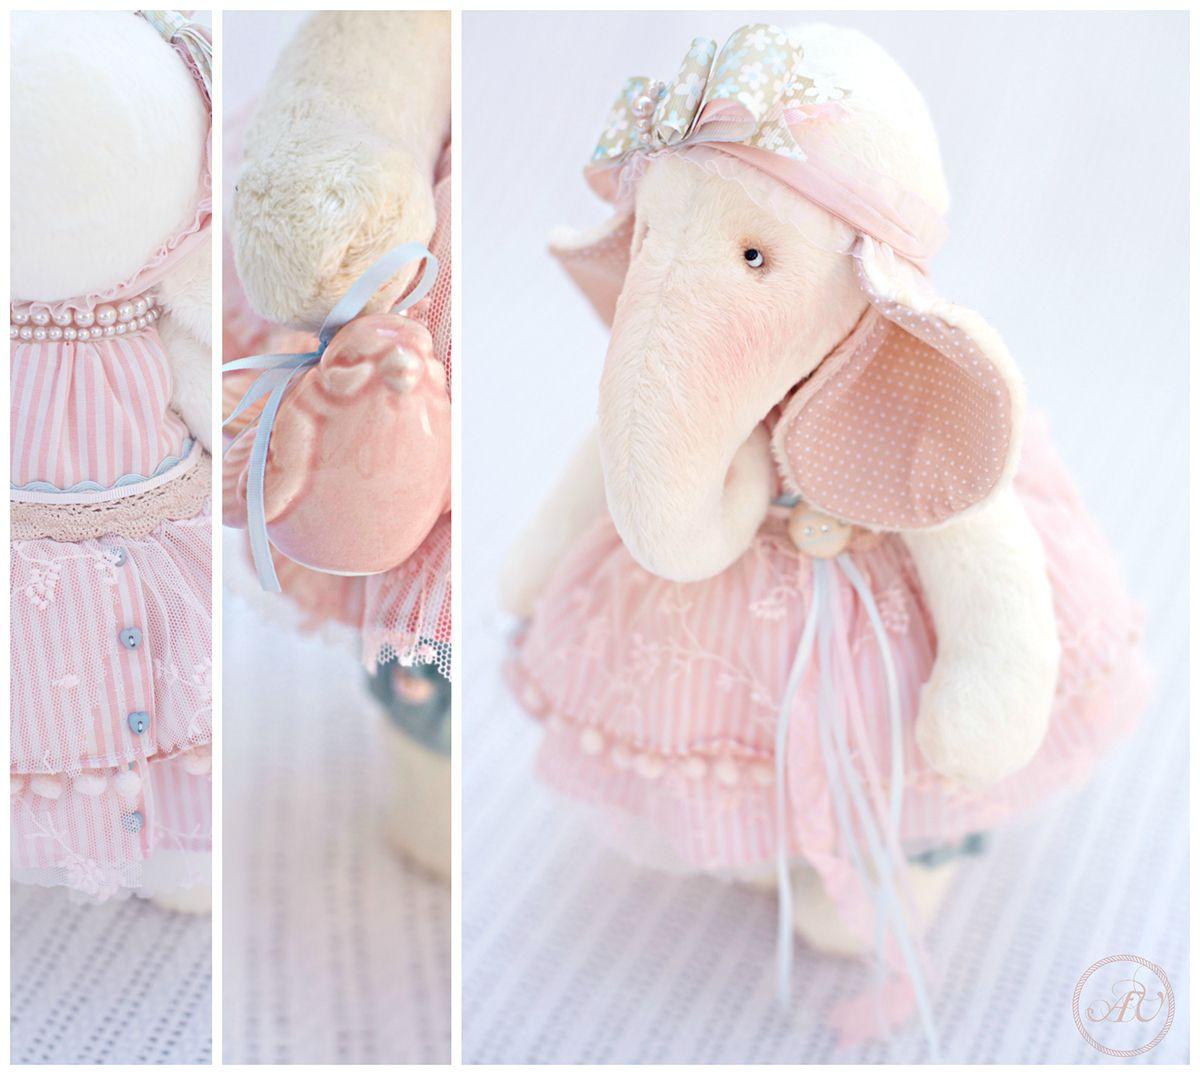 macaruna is big elephant 35 cm | Dolls vicky vicky | Pinterest